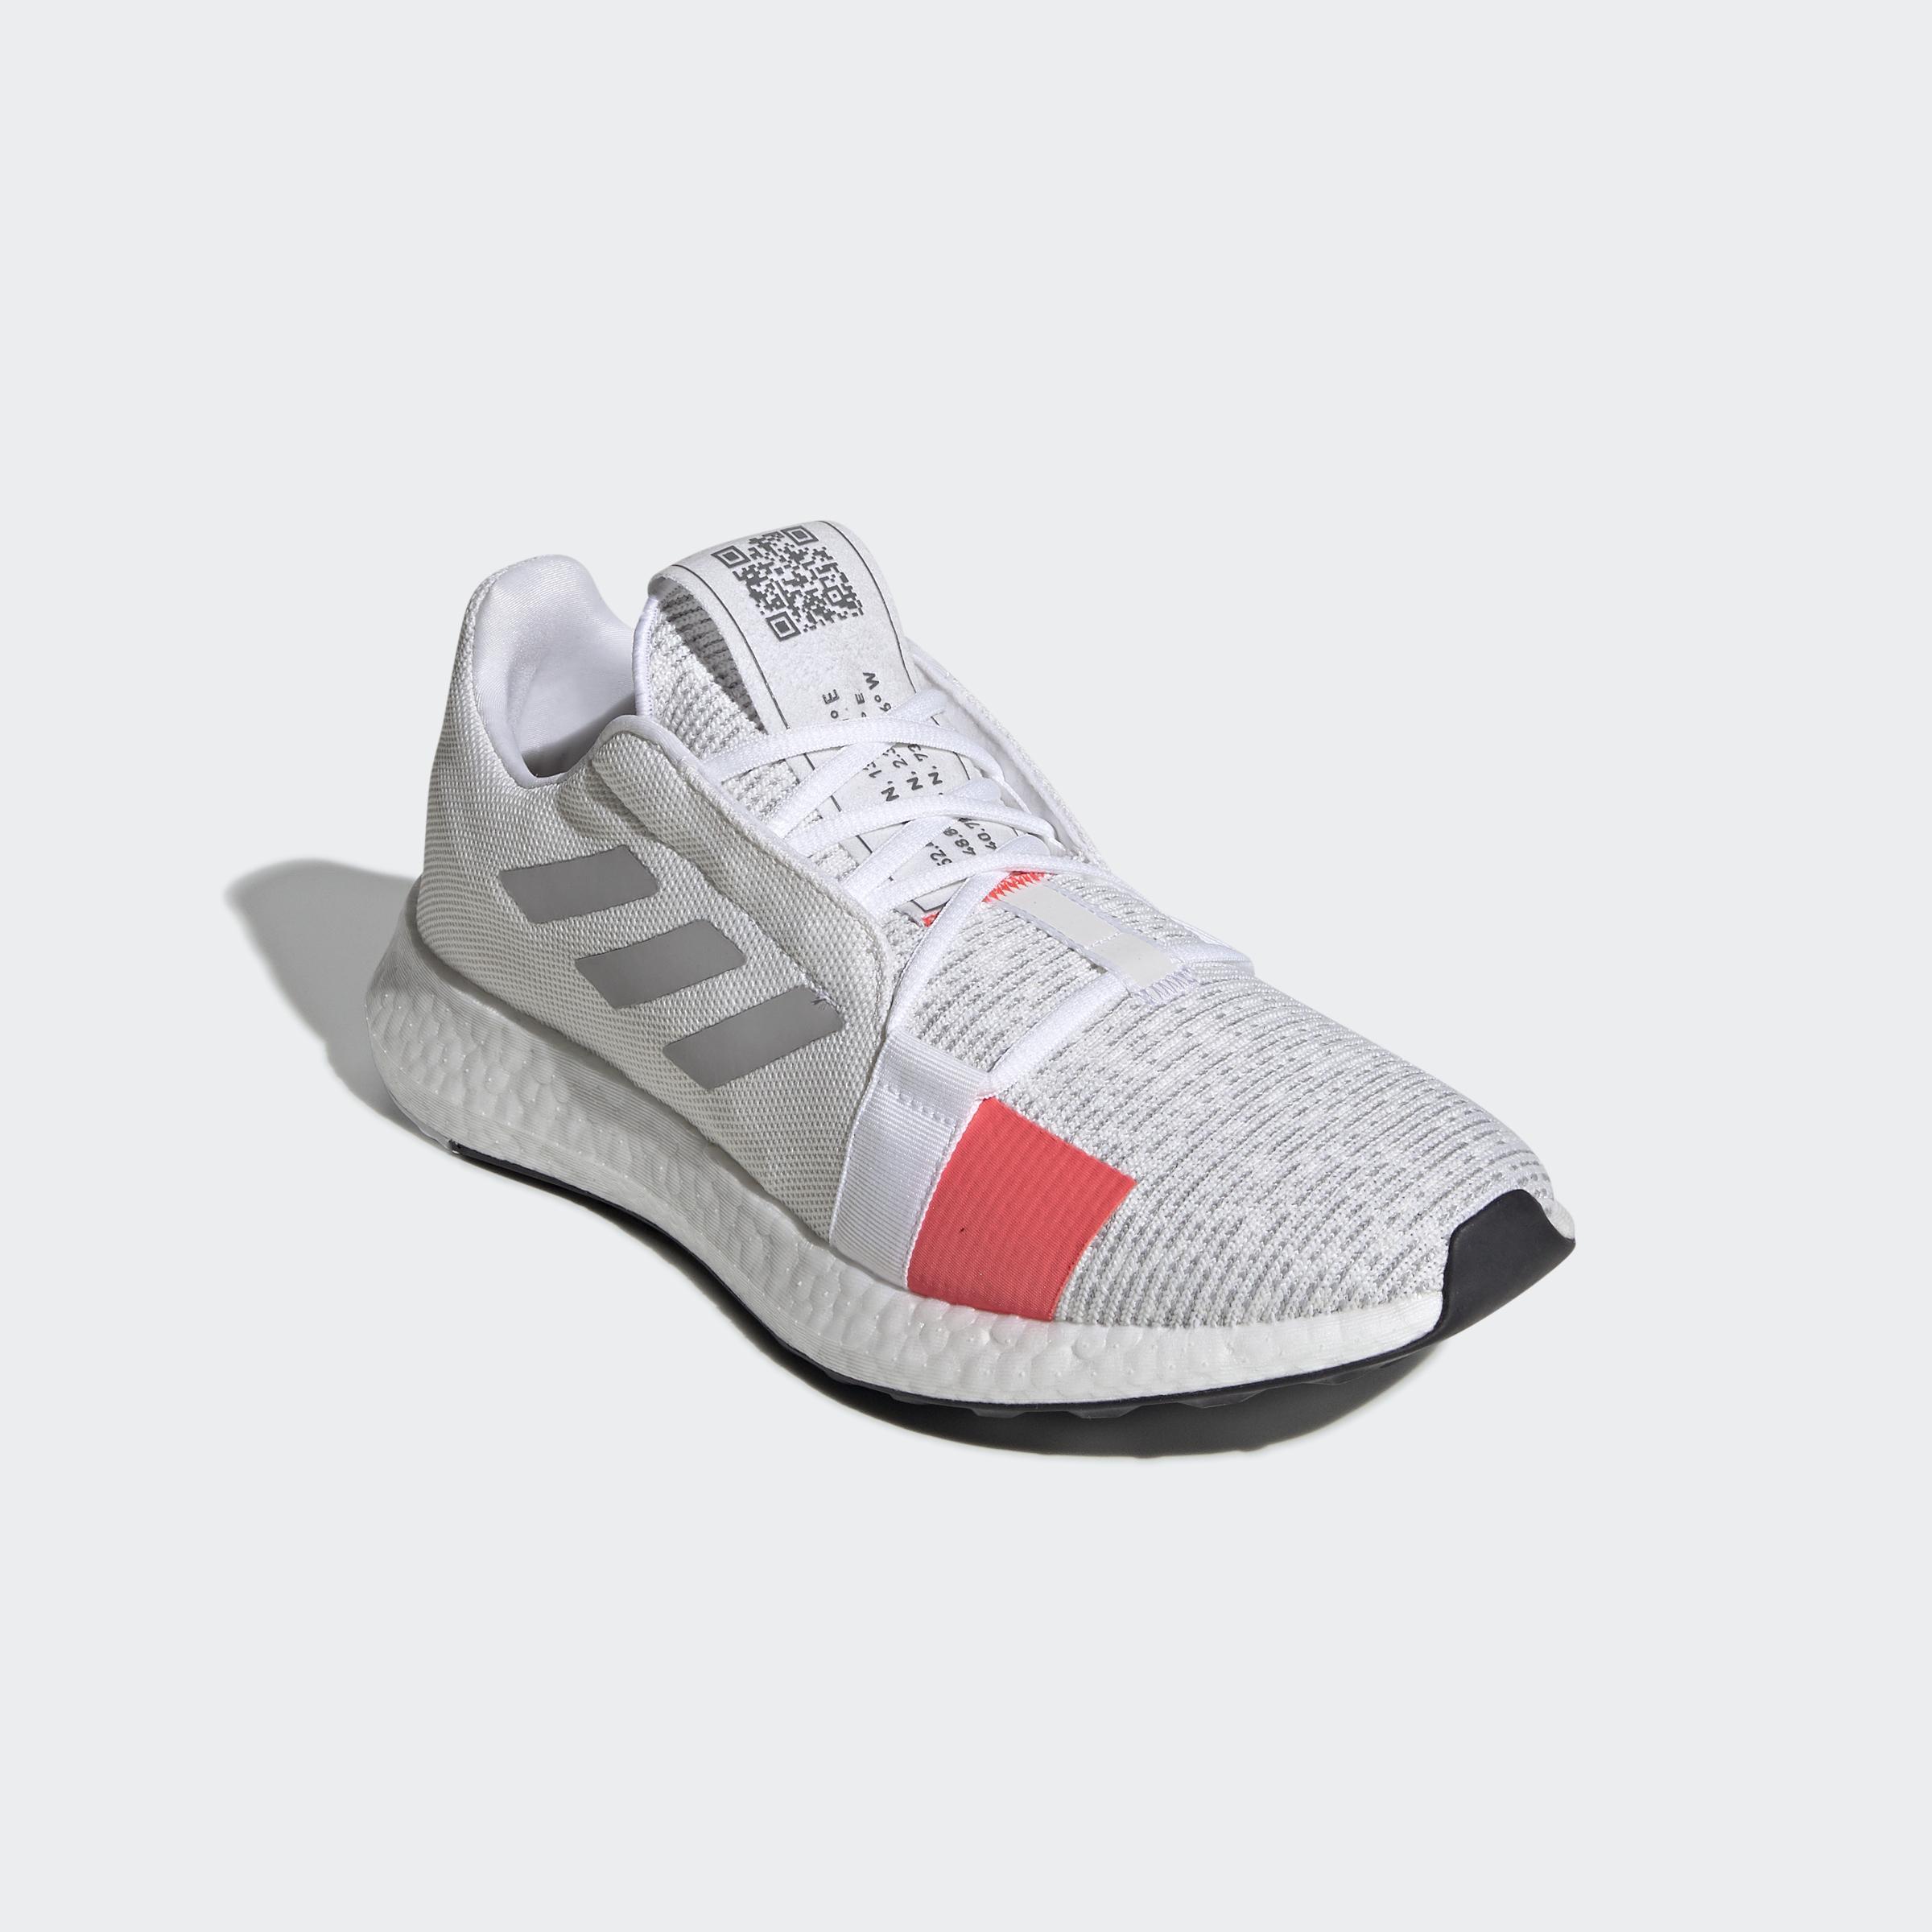 miniature 60 - adidas Senseboost Go Shoes Men's Athletic & Sneakers